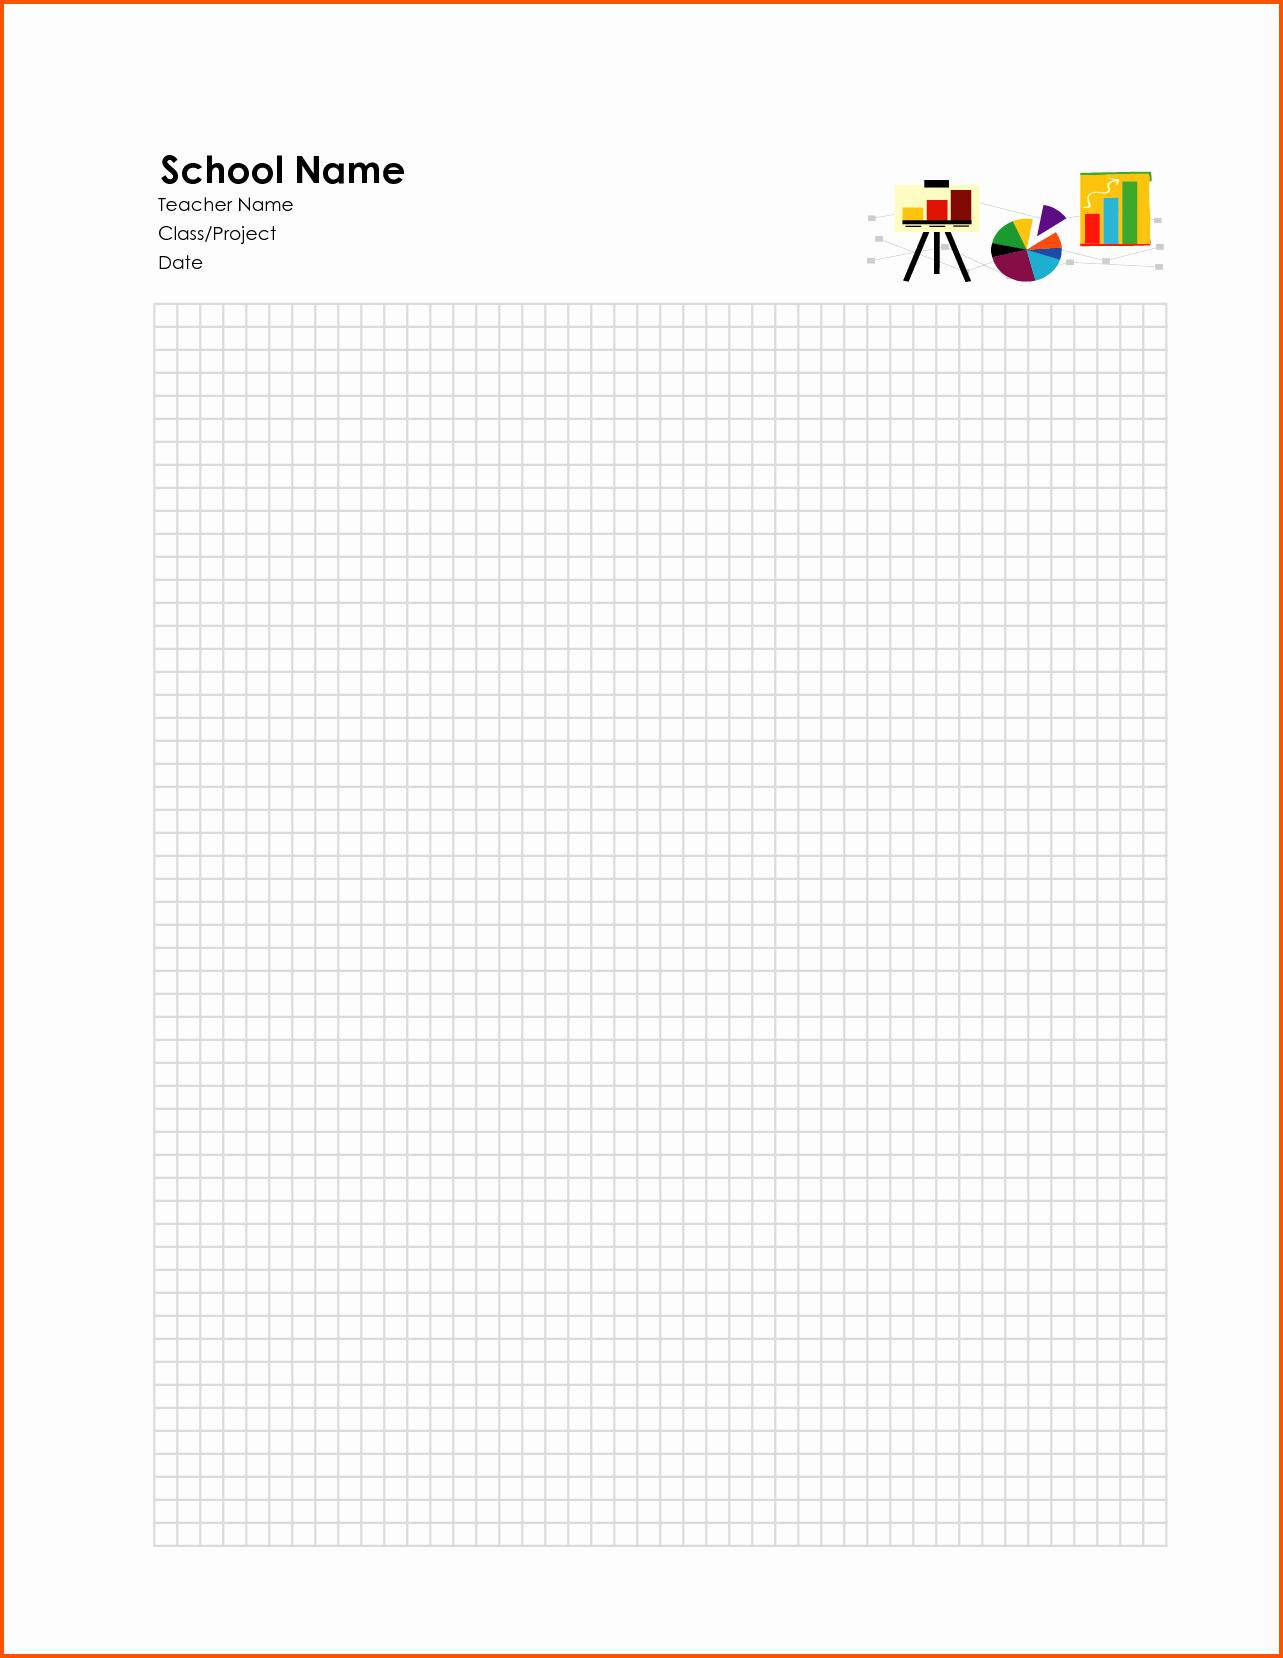 Create Graph Paper In Excel Beautiful Create Graph Paper In Excel 2013 How to Create Grid